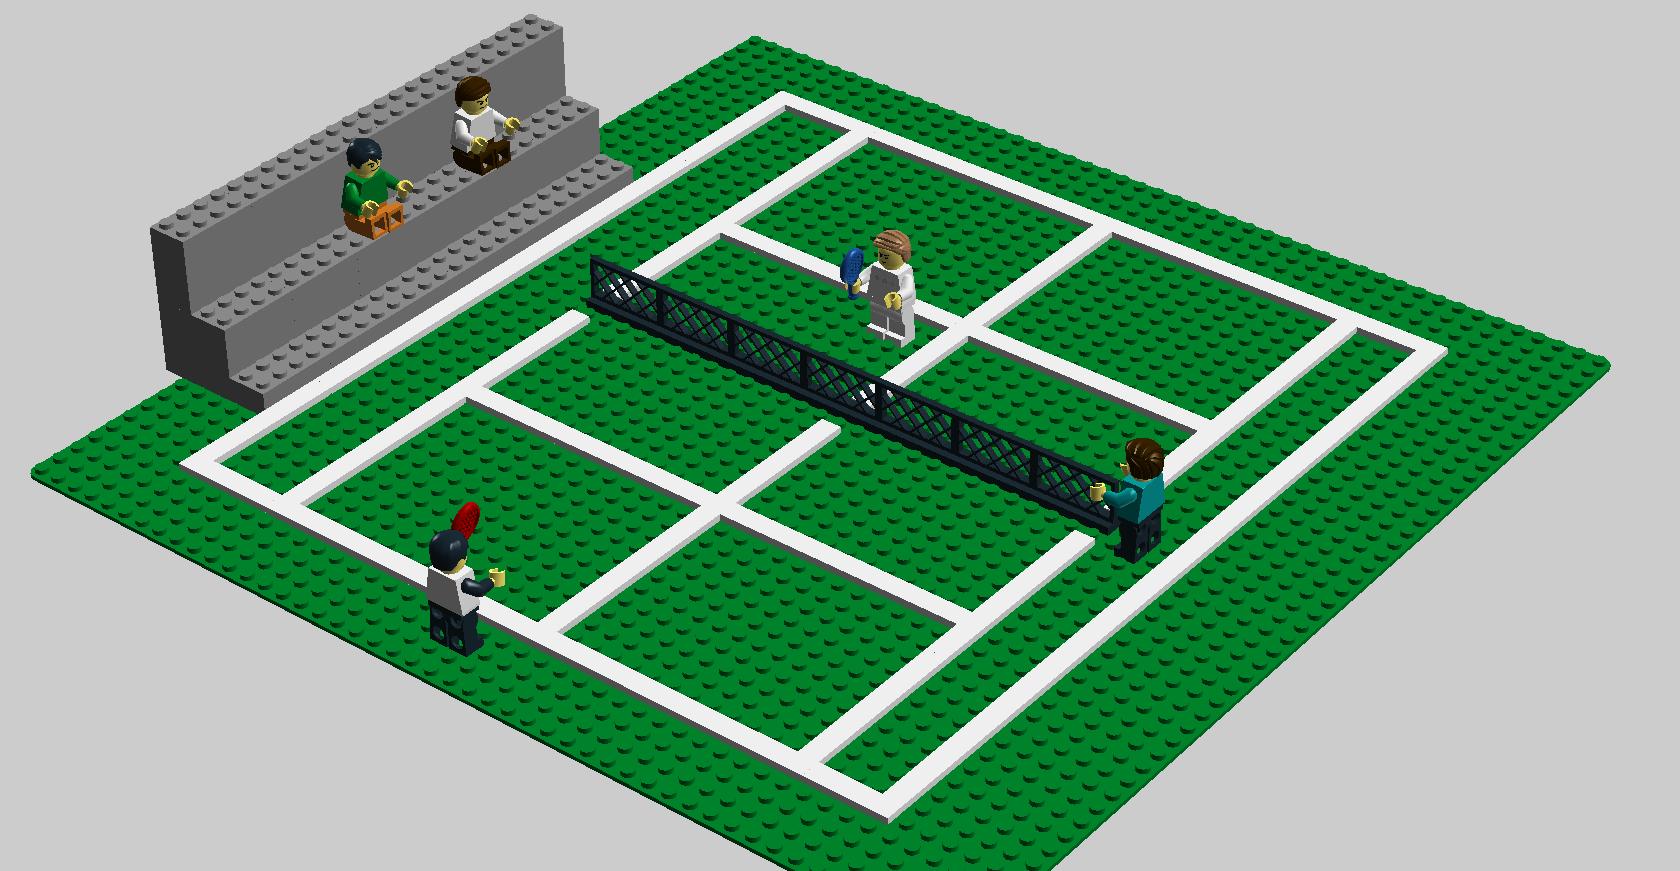 Grass Tennis Court Legos Lego Lego Building